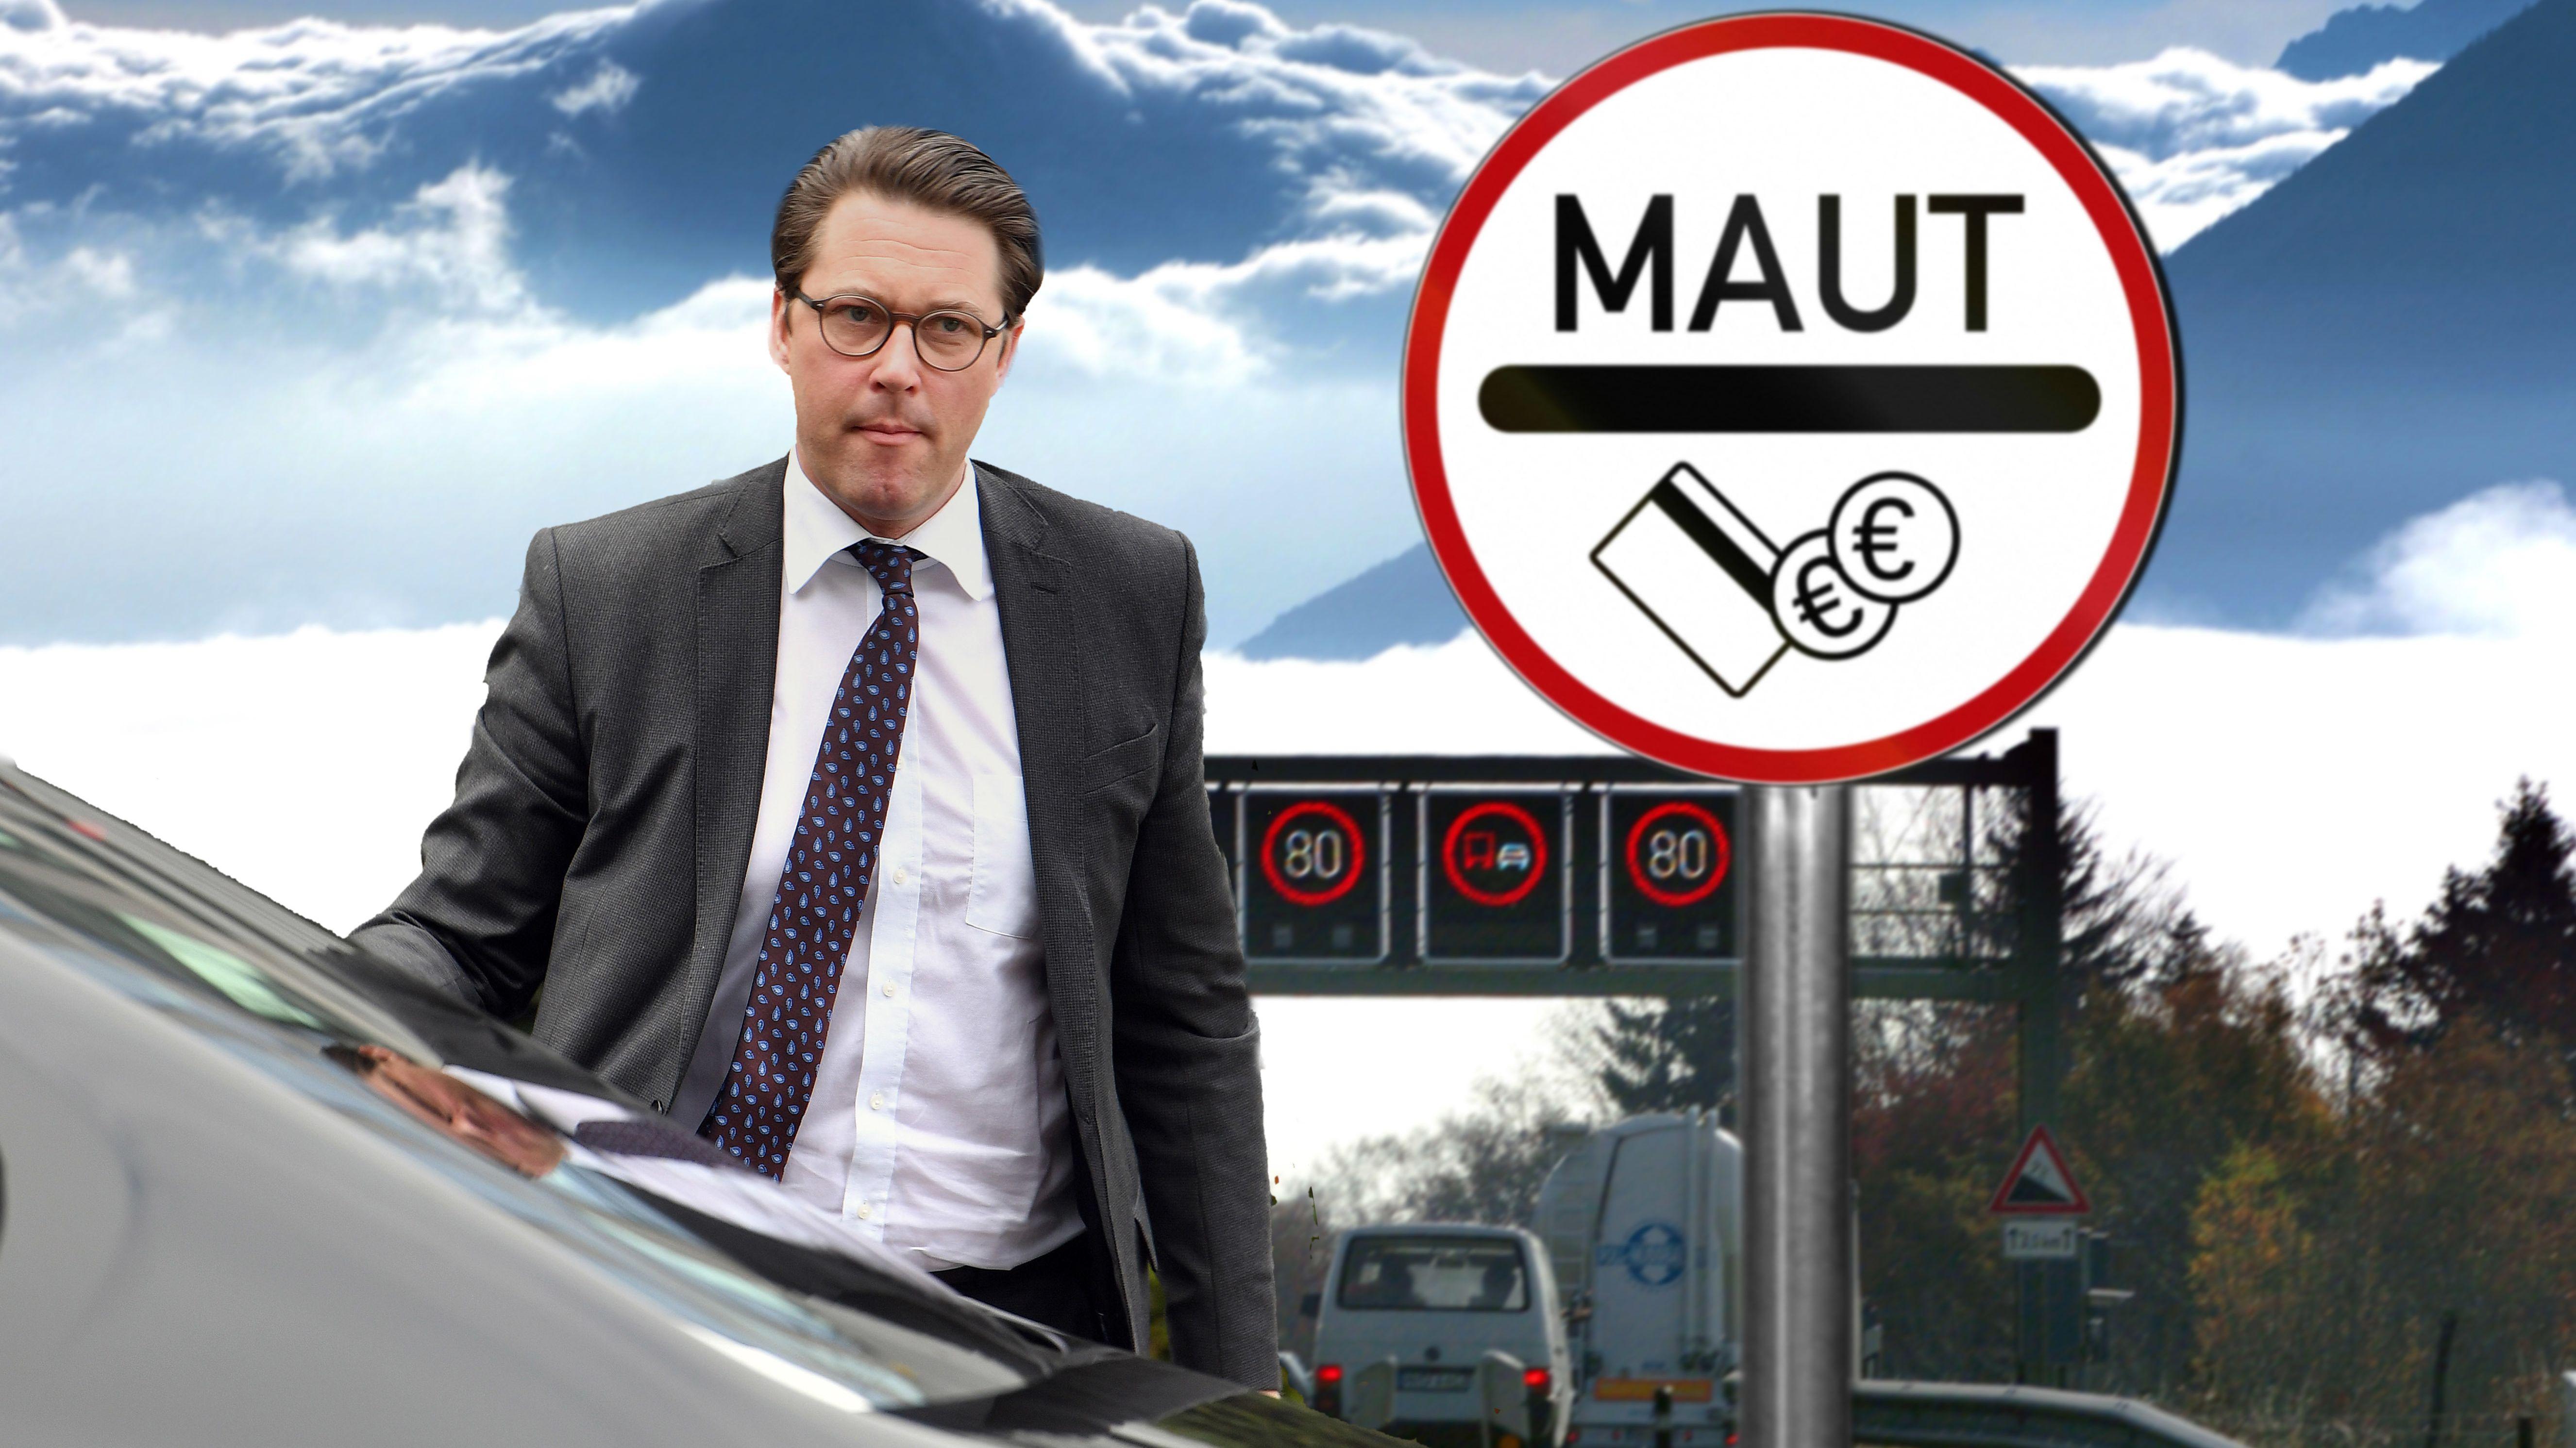 Bundesverkehrsminister Andreas Scheuer wegen Mautdebakels unter Druck. (Bildmontage)